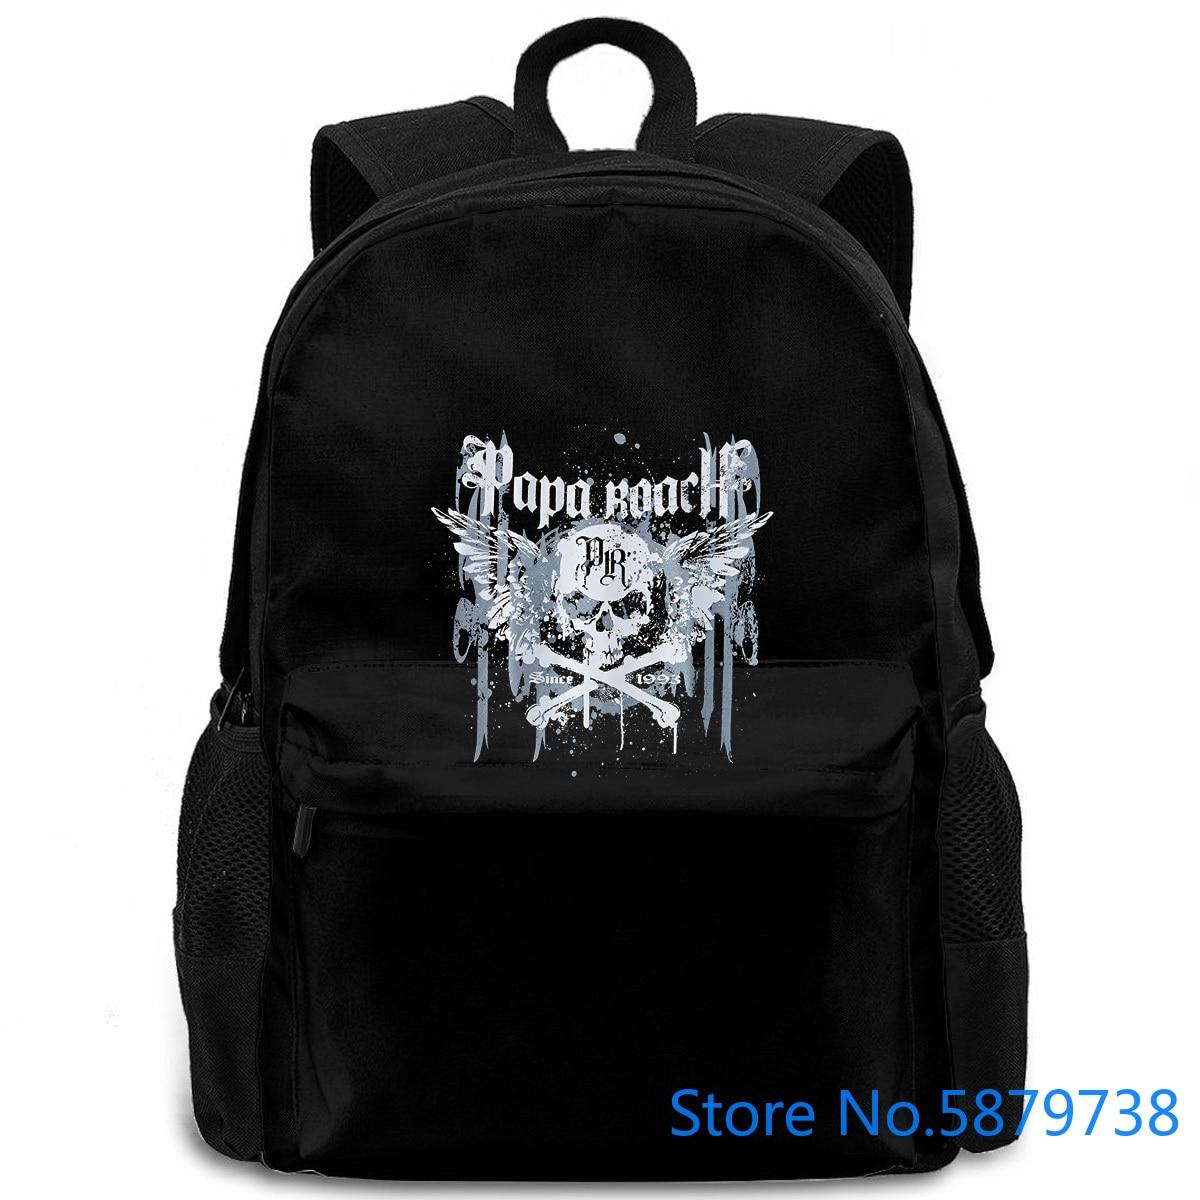 Papa Roach Crossbones Drips banda Logo oficial para hombre negro Hip Hop impresión mujeres hombres mochila laptop viaje escuela adulto